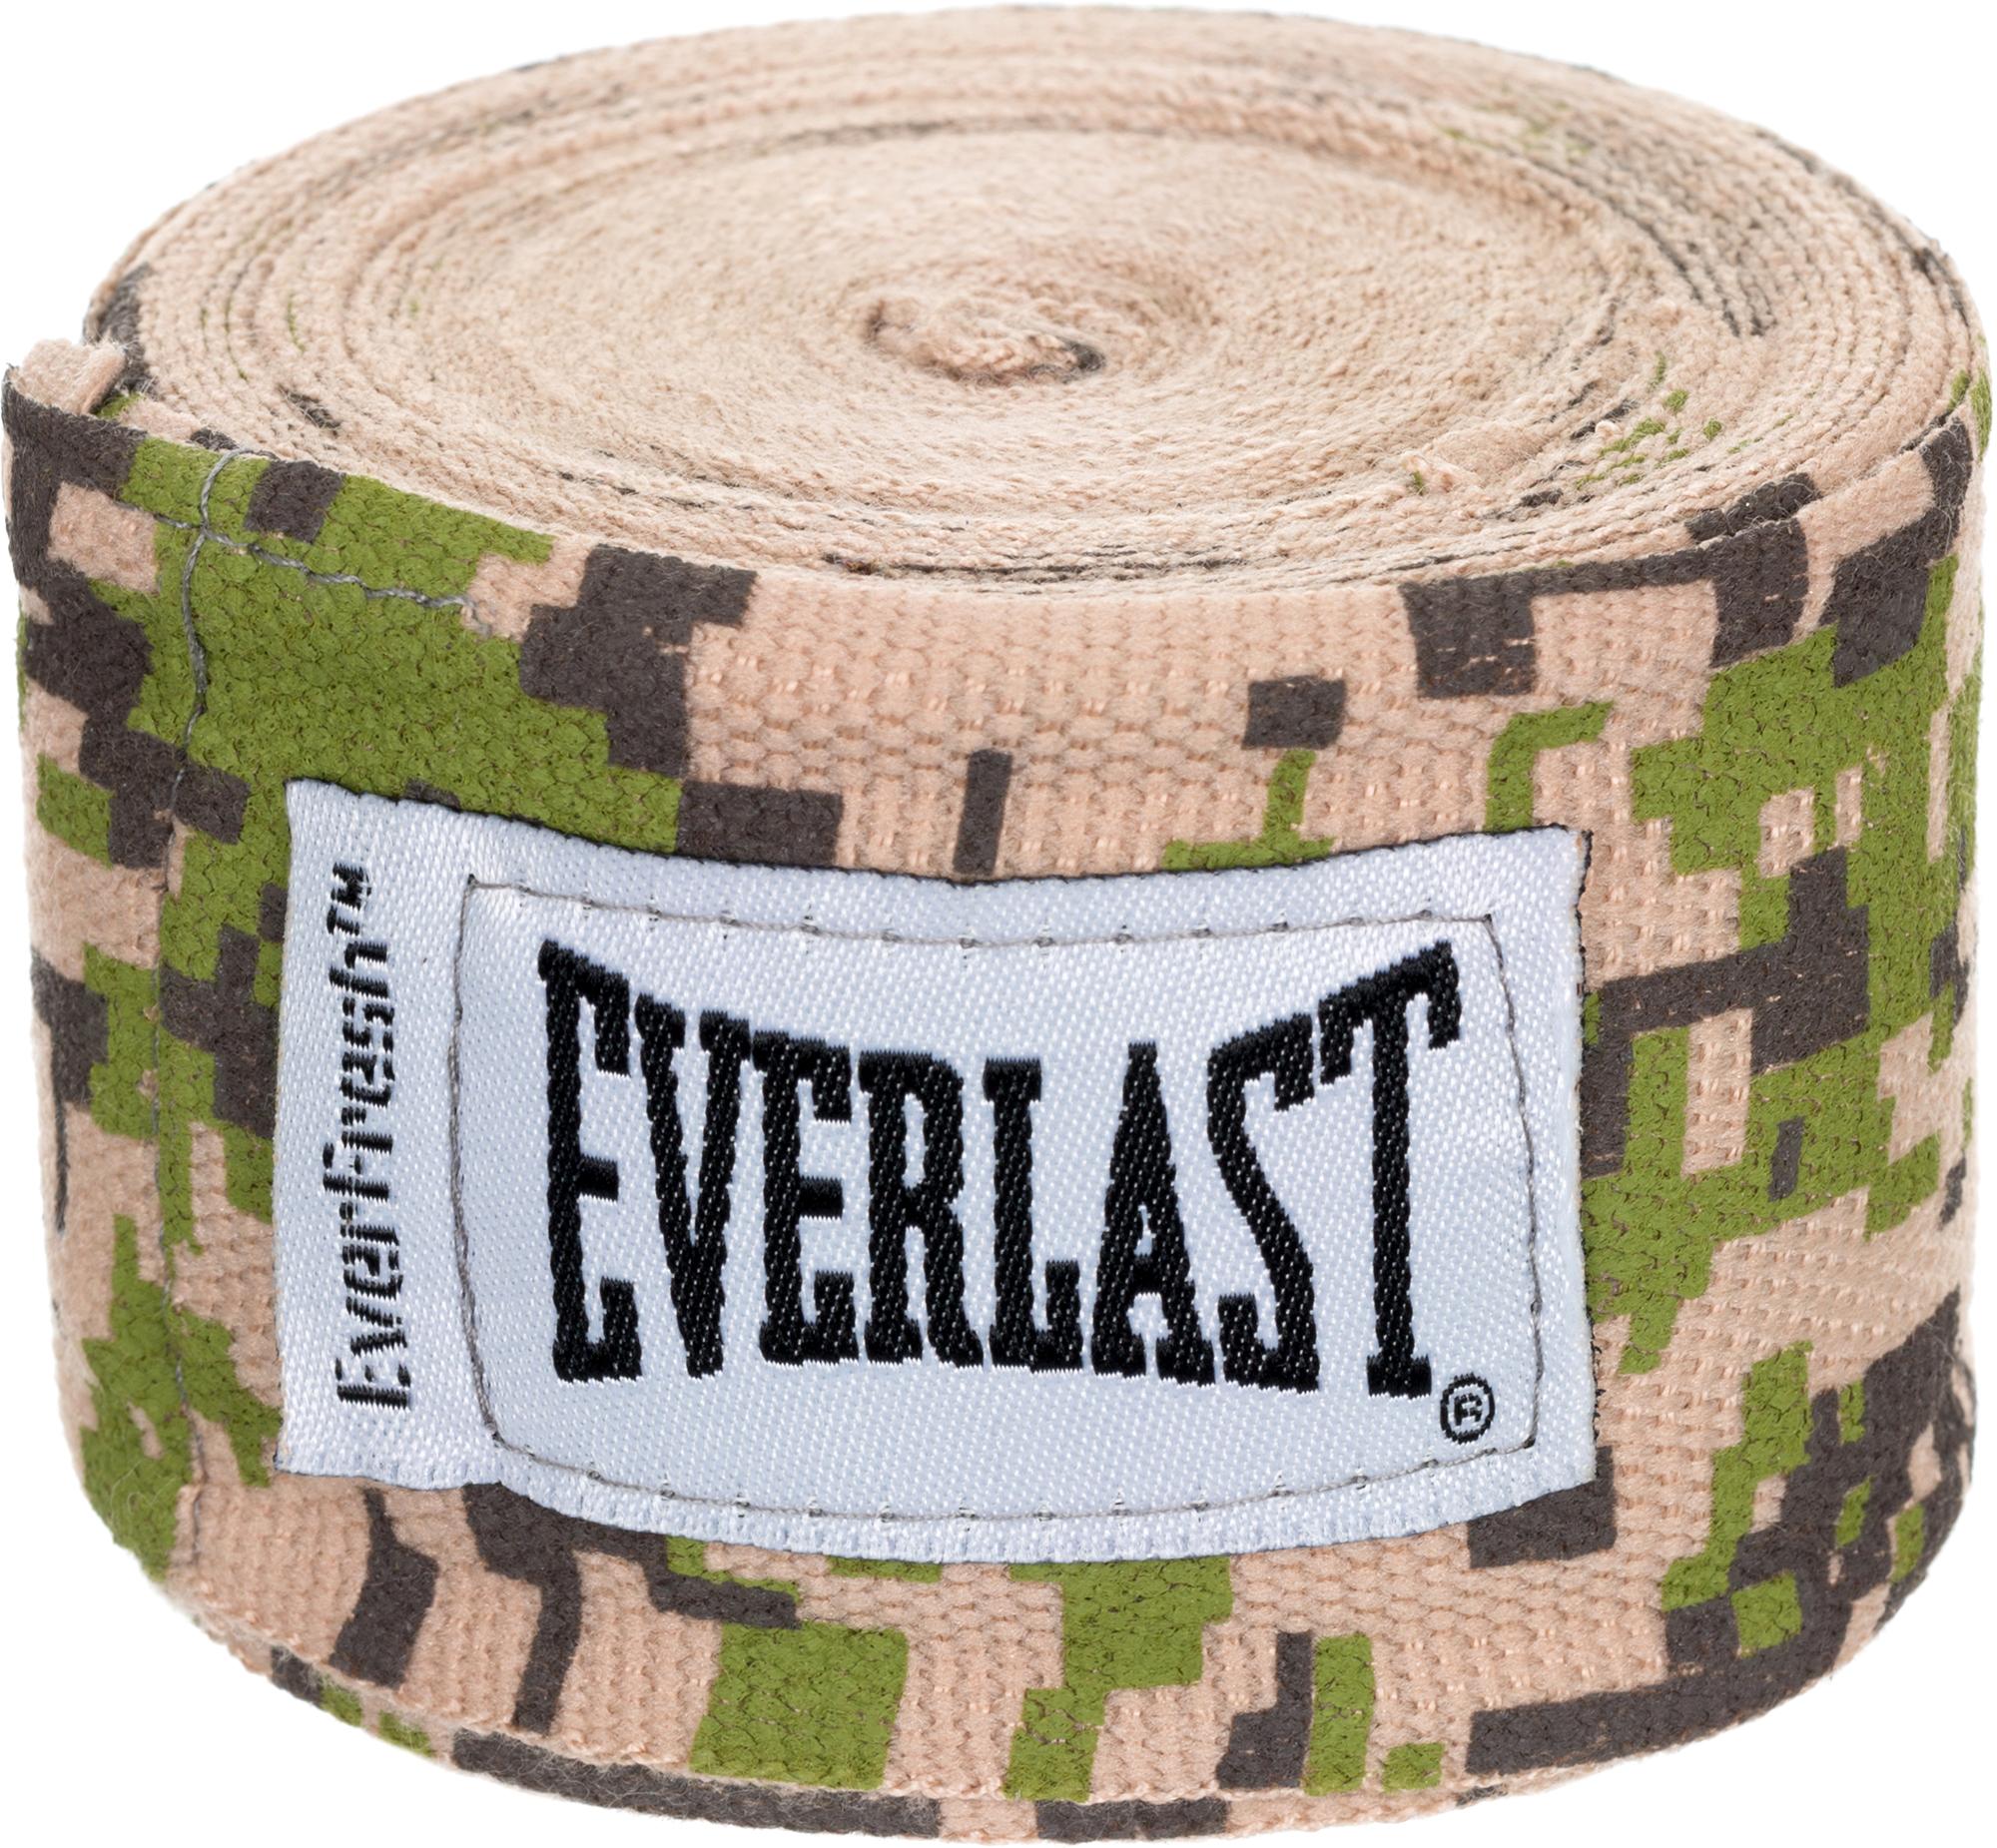 Everlast Бинты Everlast 3,5 м, 2 шт., размер Без размера